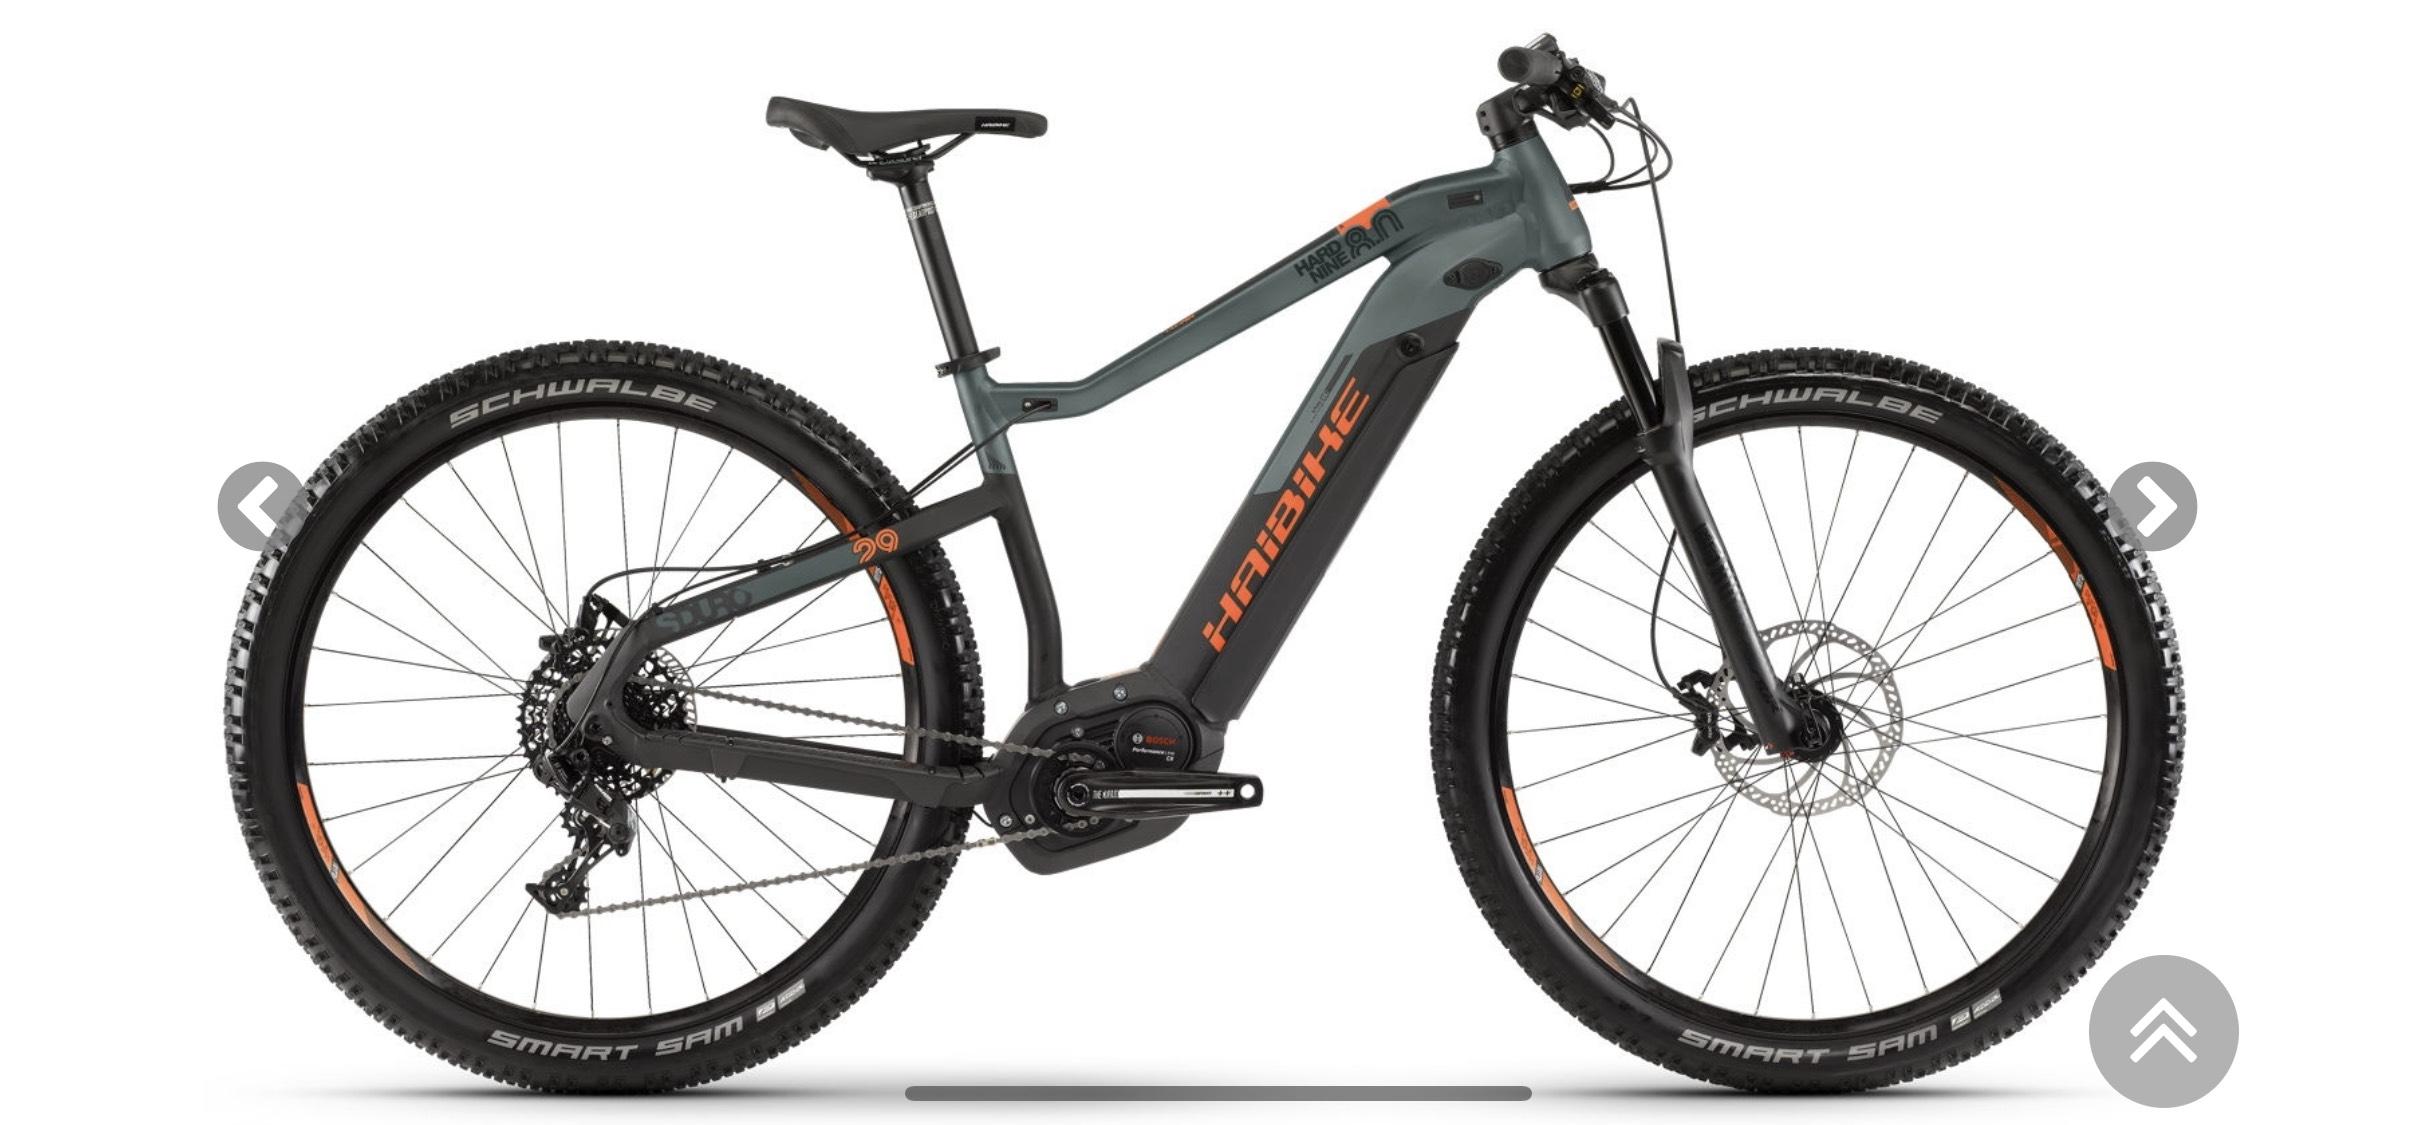 "HAIBIKE - SDURO HardNine 8.0 29"" e-bike mit Bosch Performance Motor"